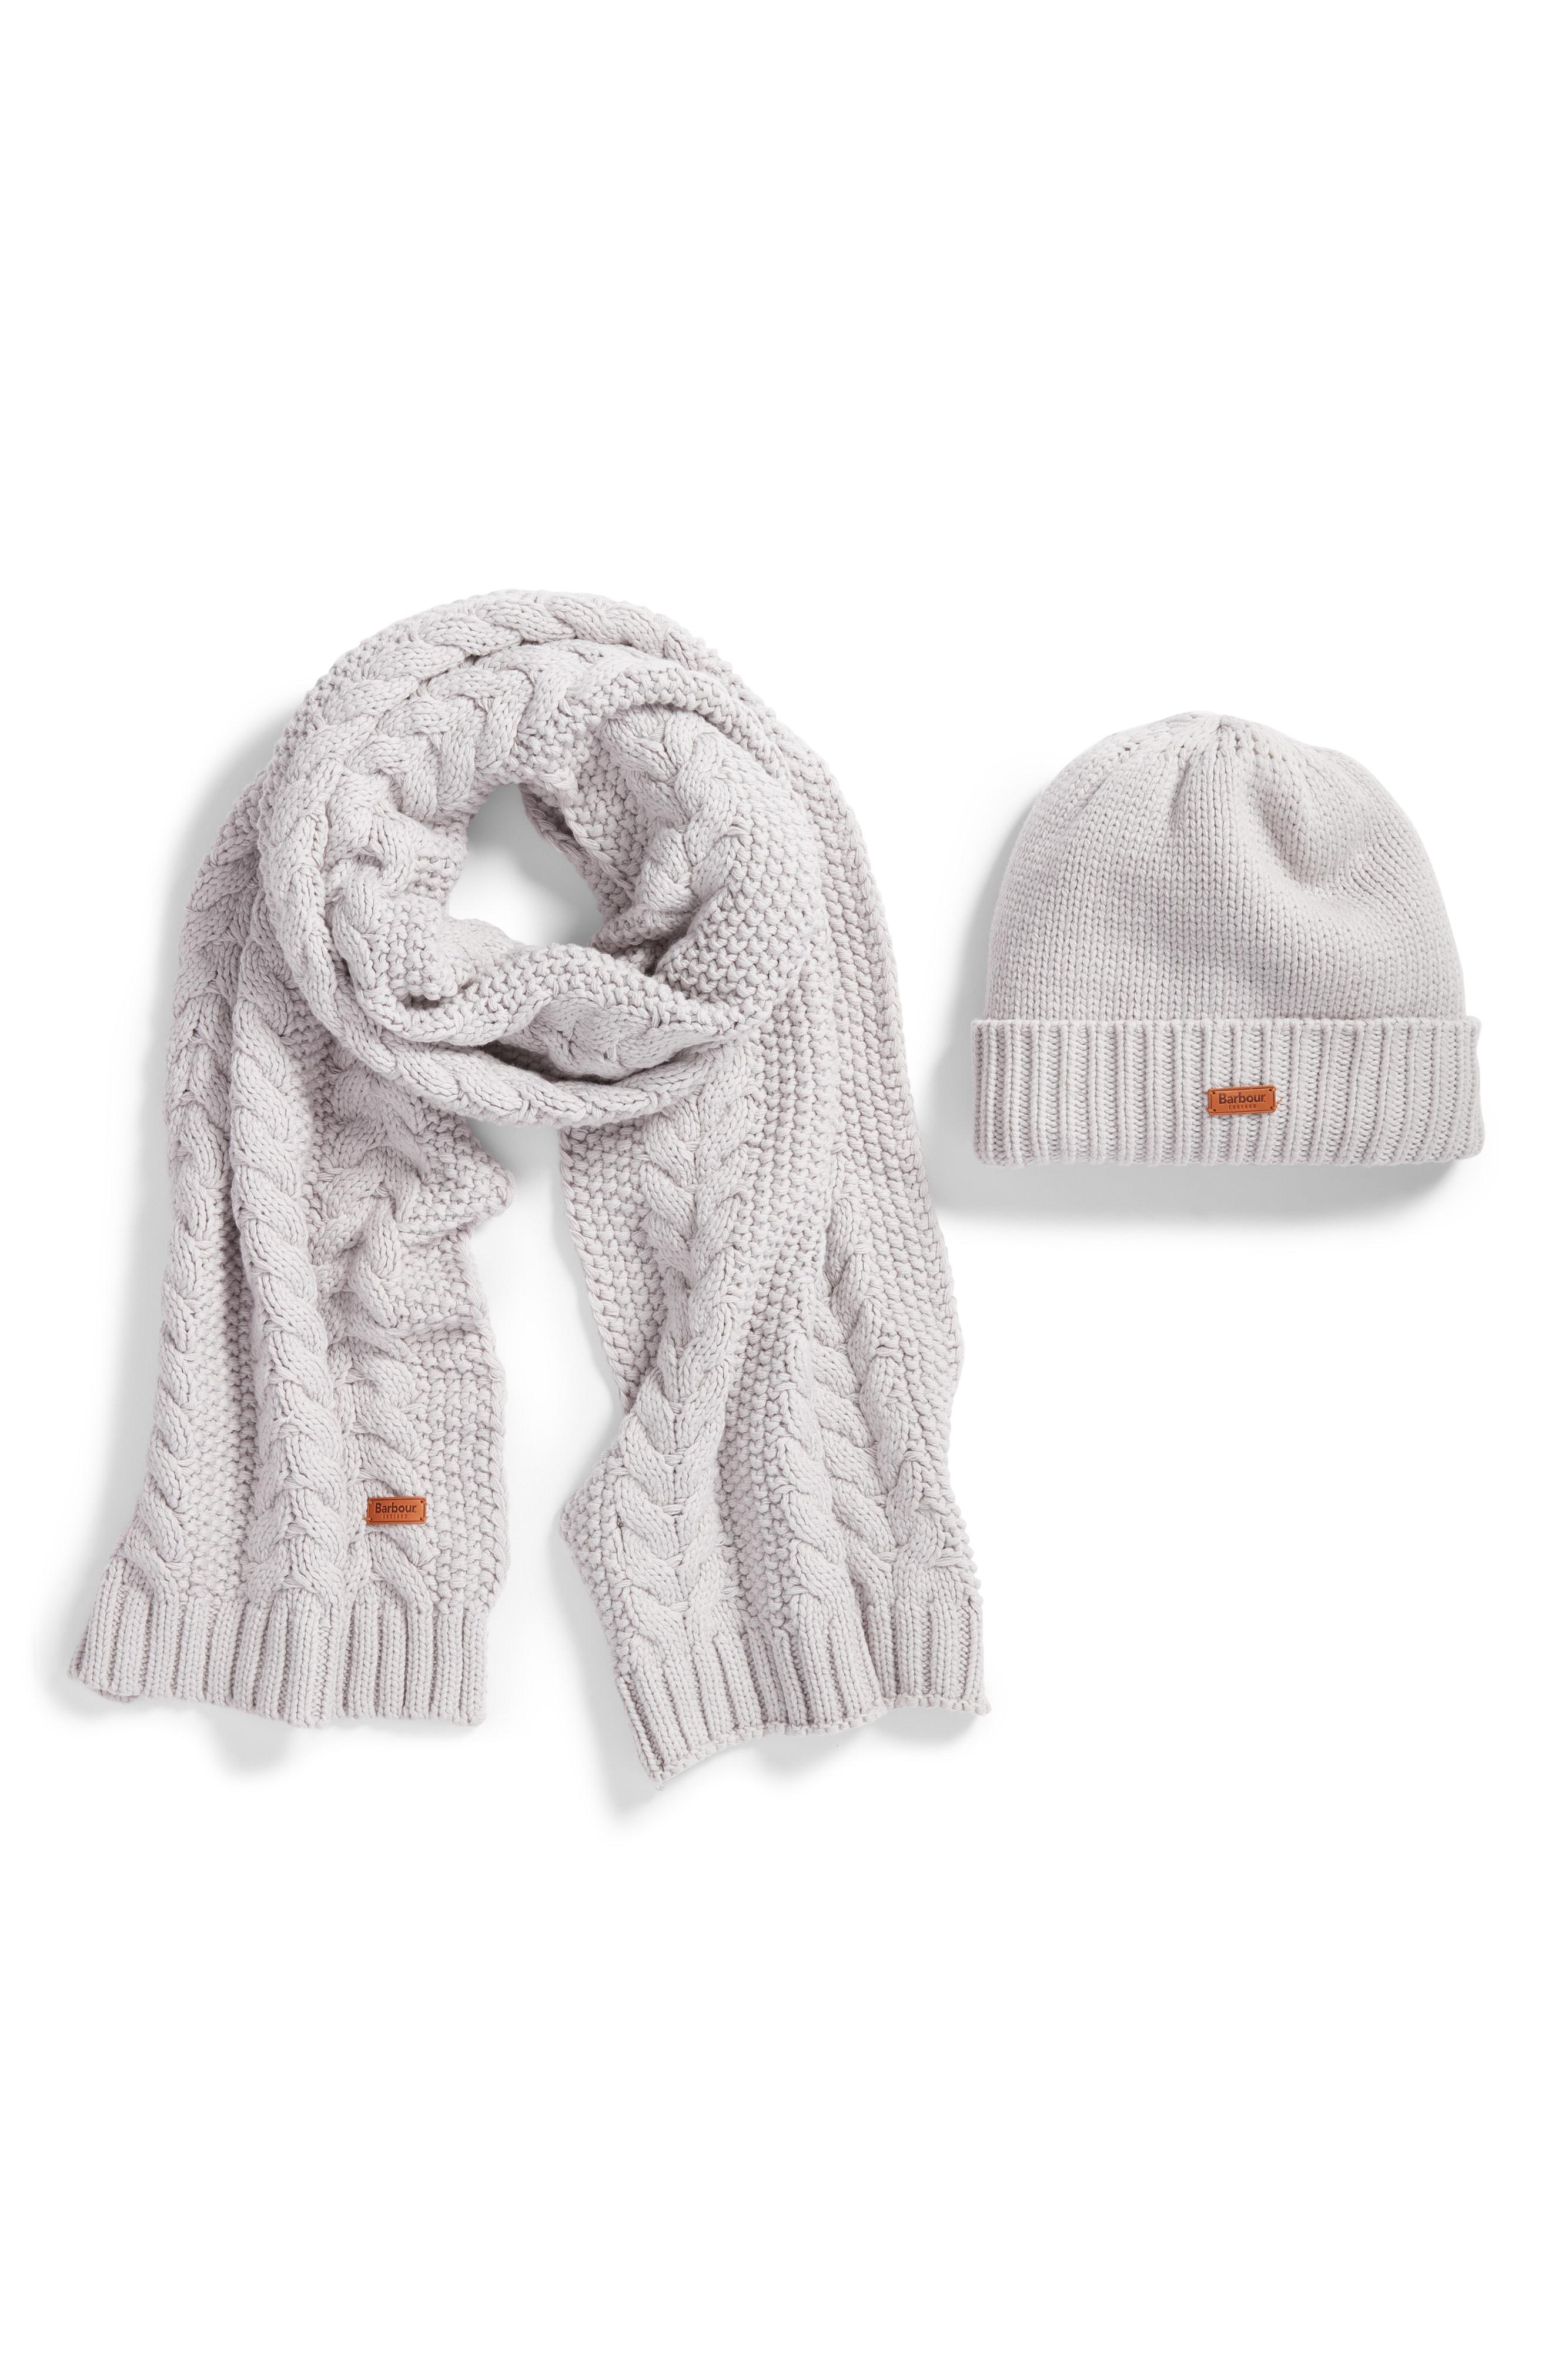 Barbour Cable Knit Hat & Scarf Set